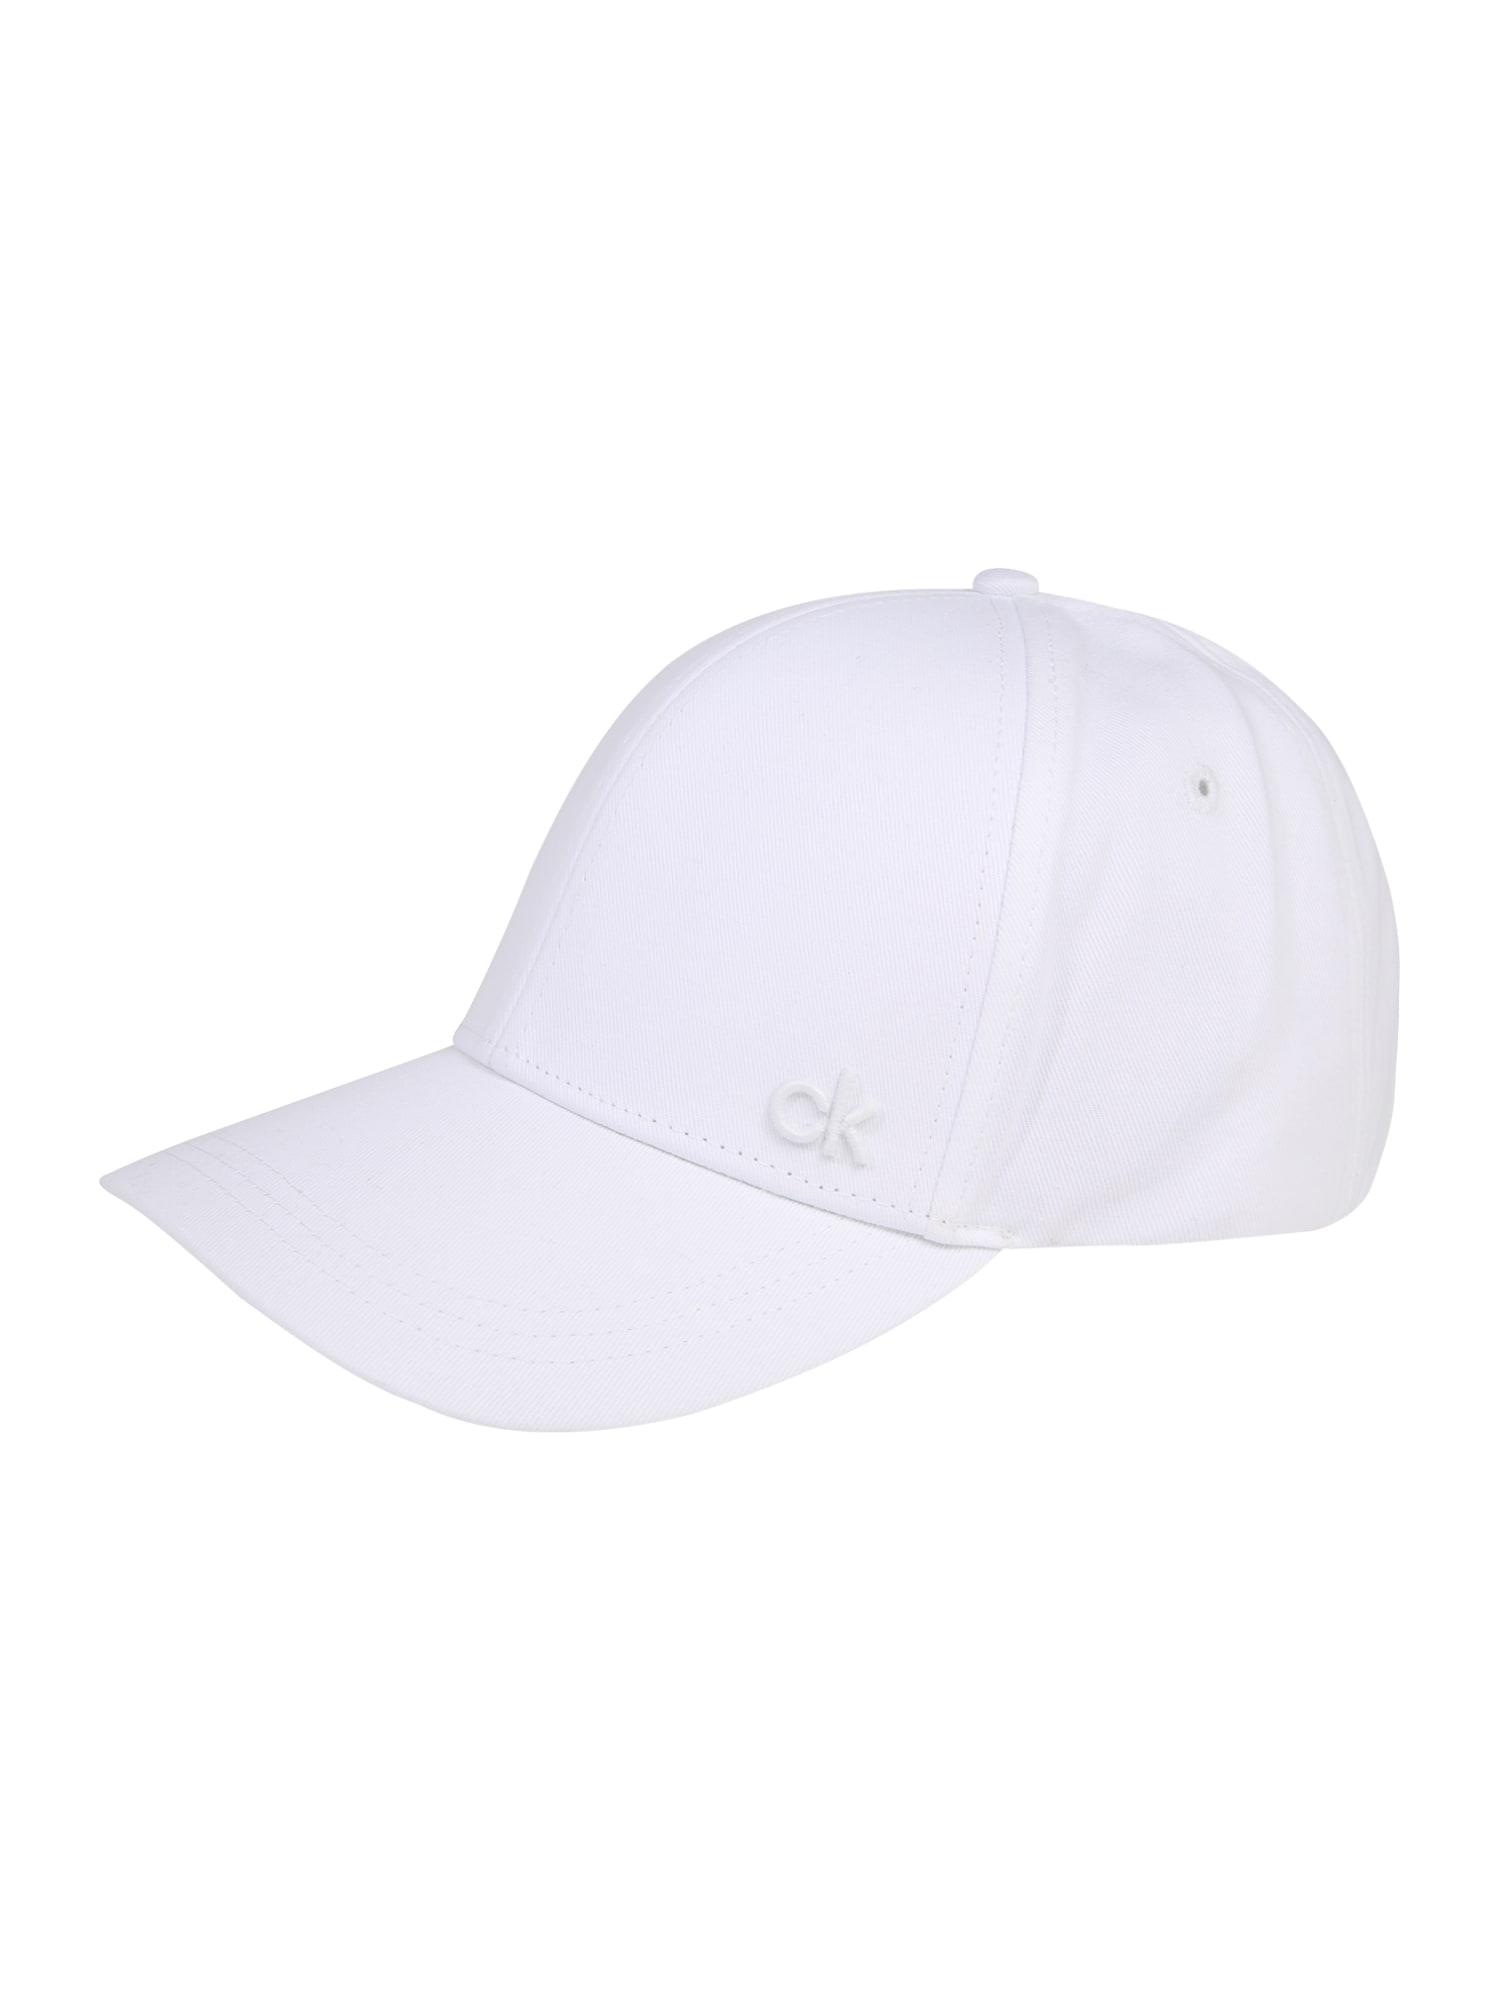 Čepice bílá Calvin Klein